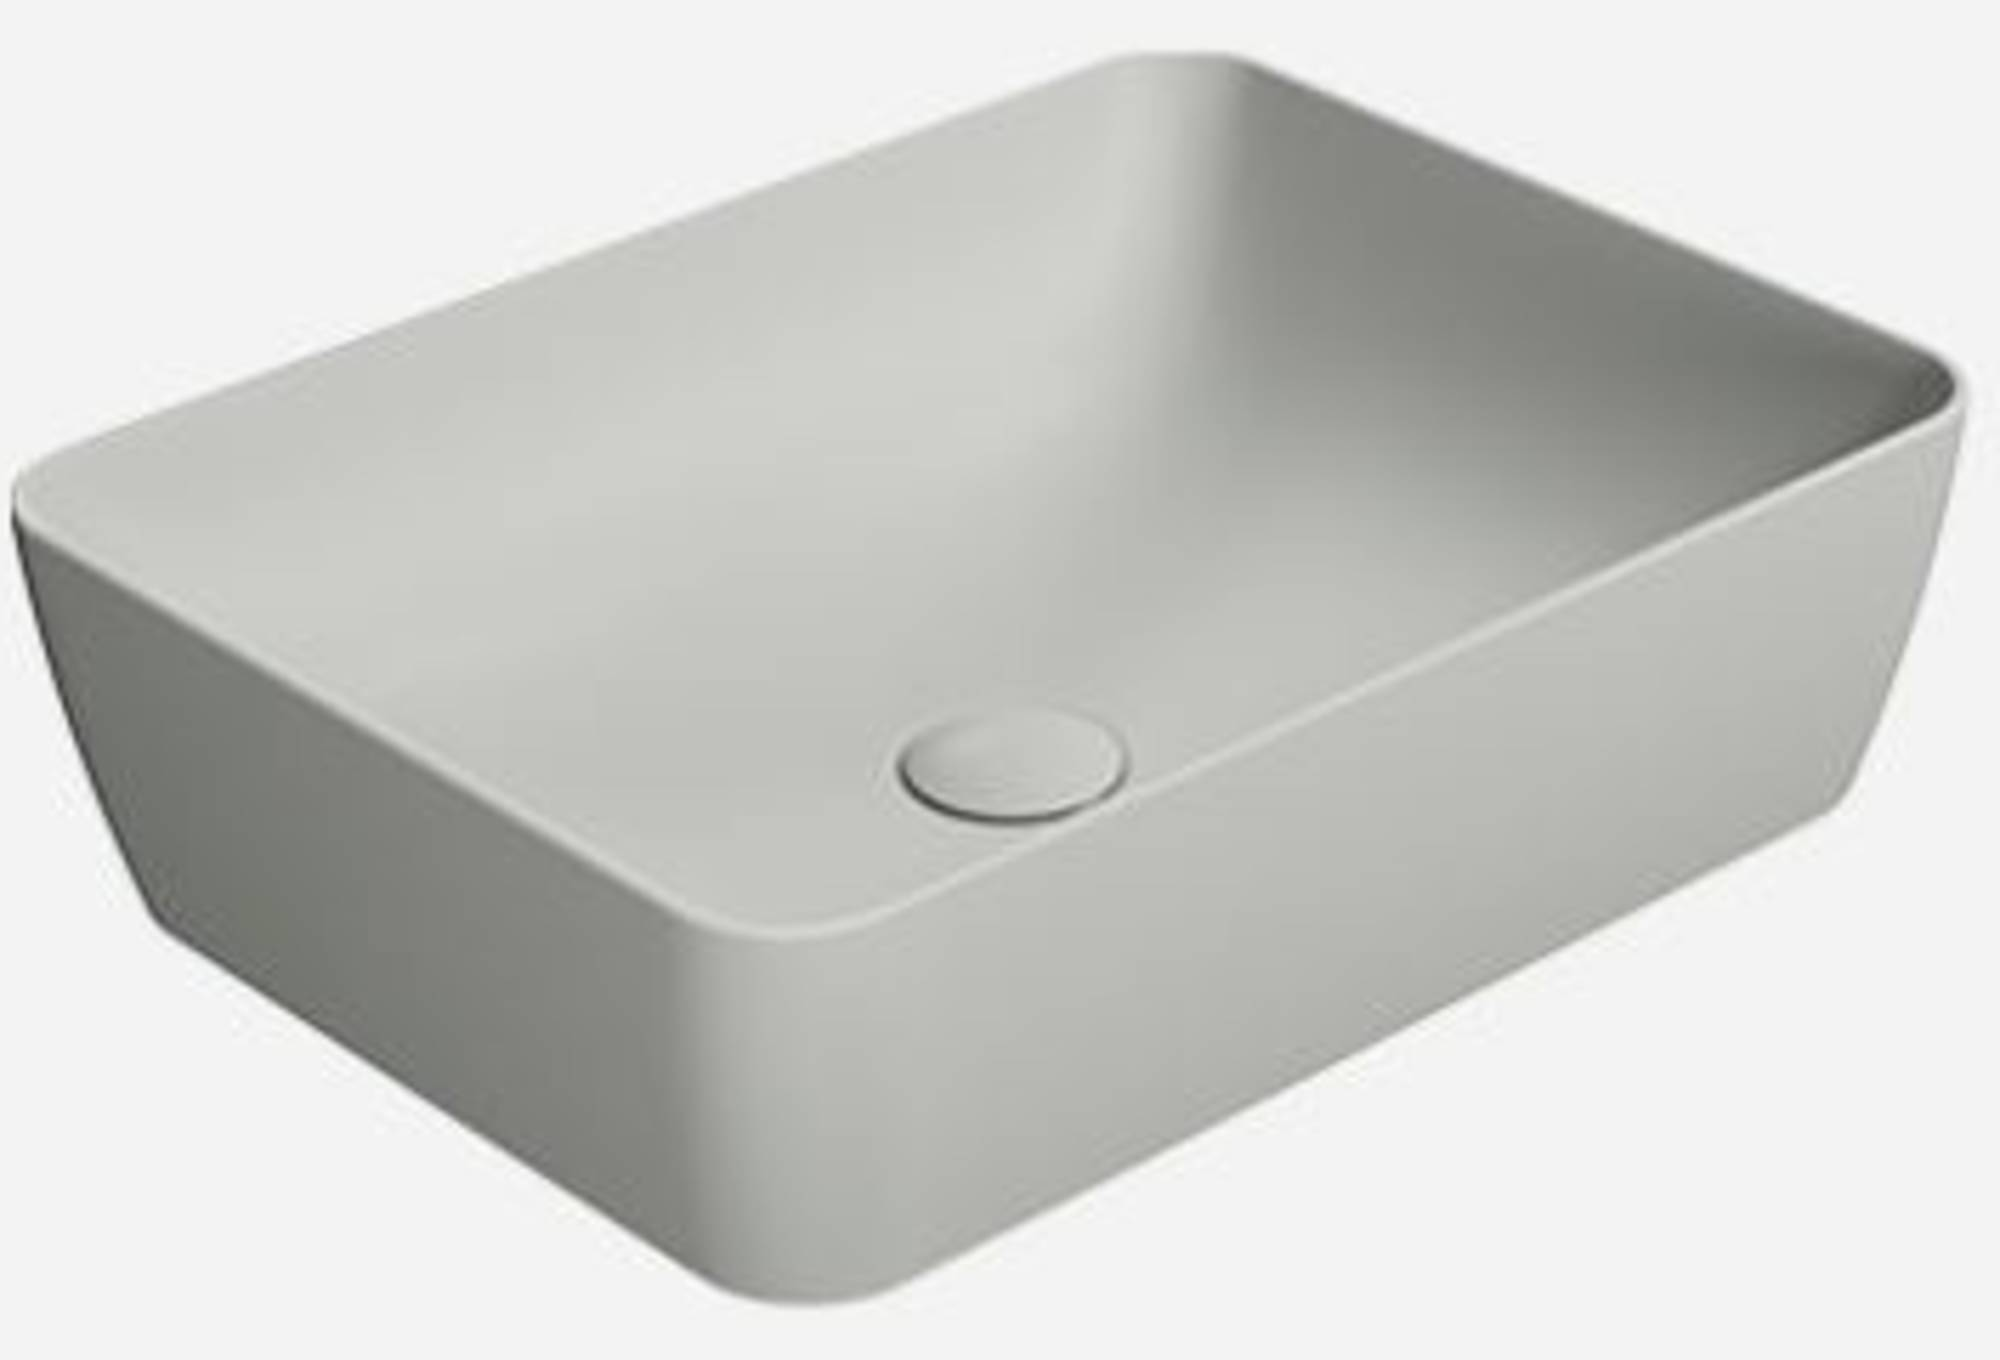 Ben Stilo Opzetkom Keramiek 50x38x14 cm Cement Grijs